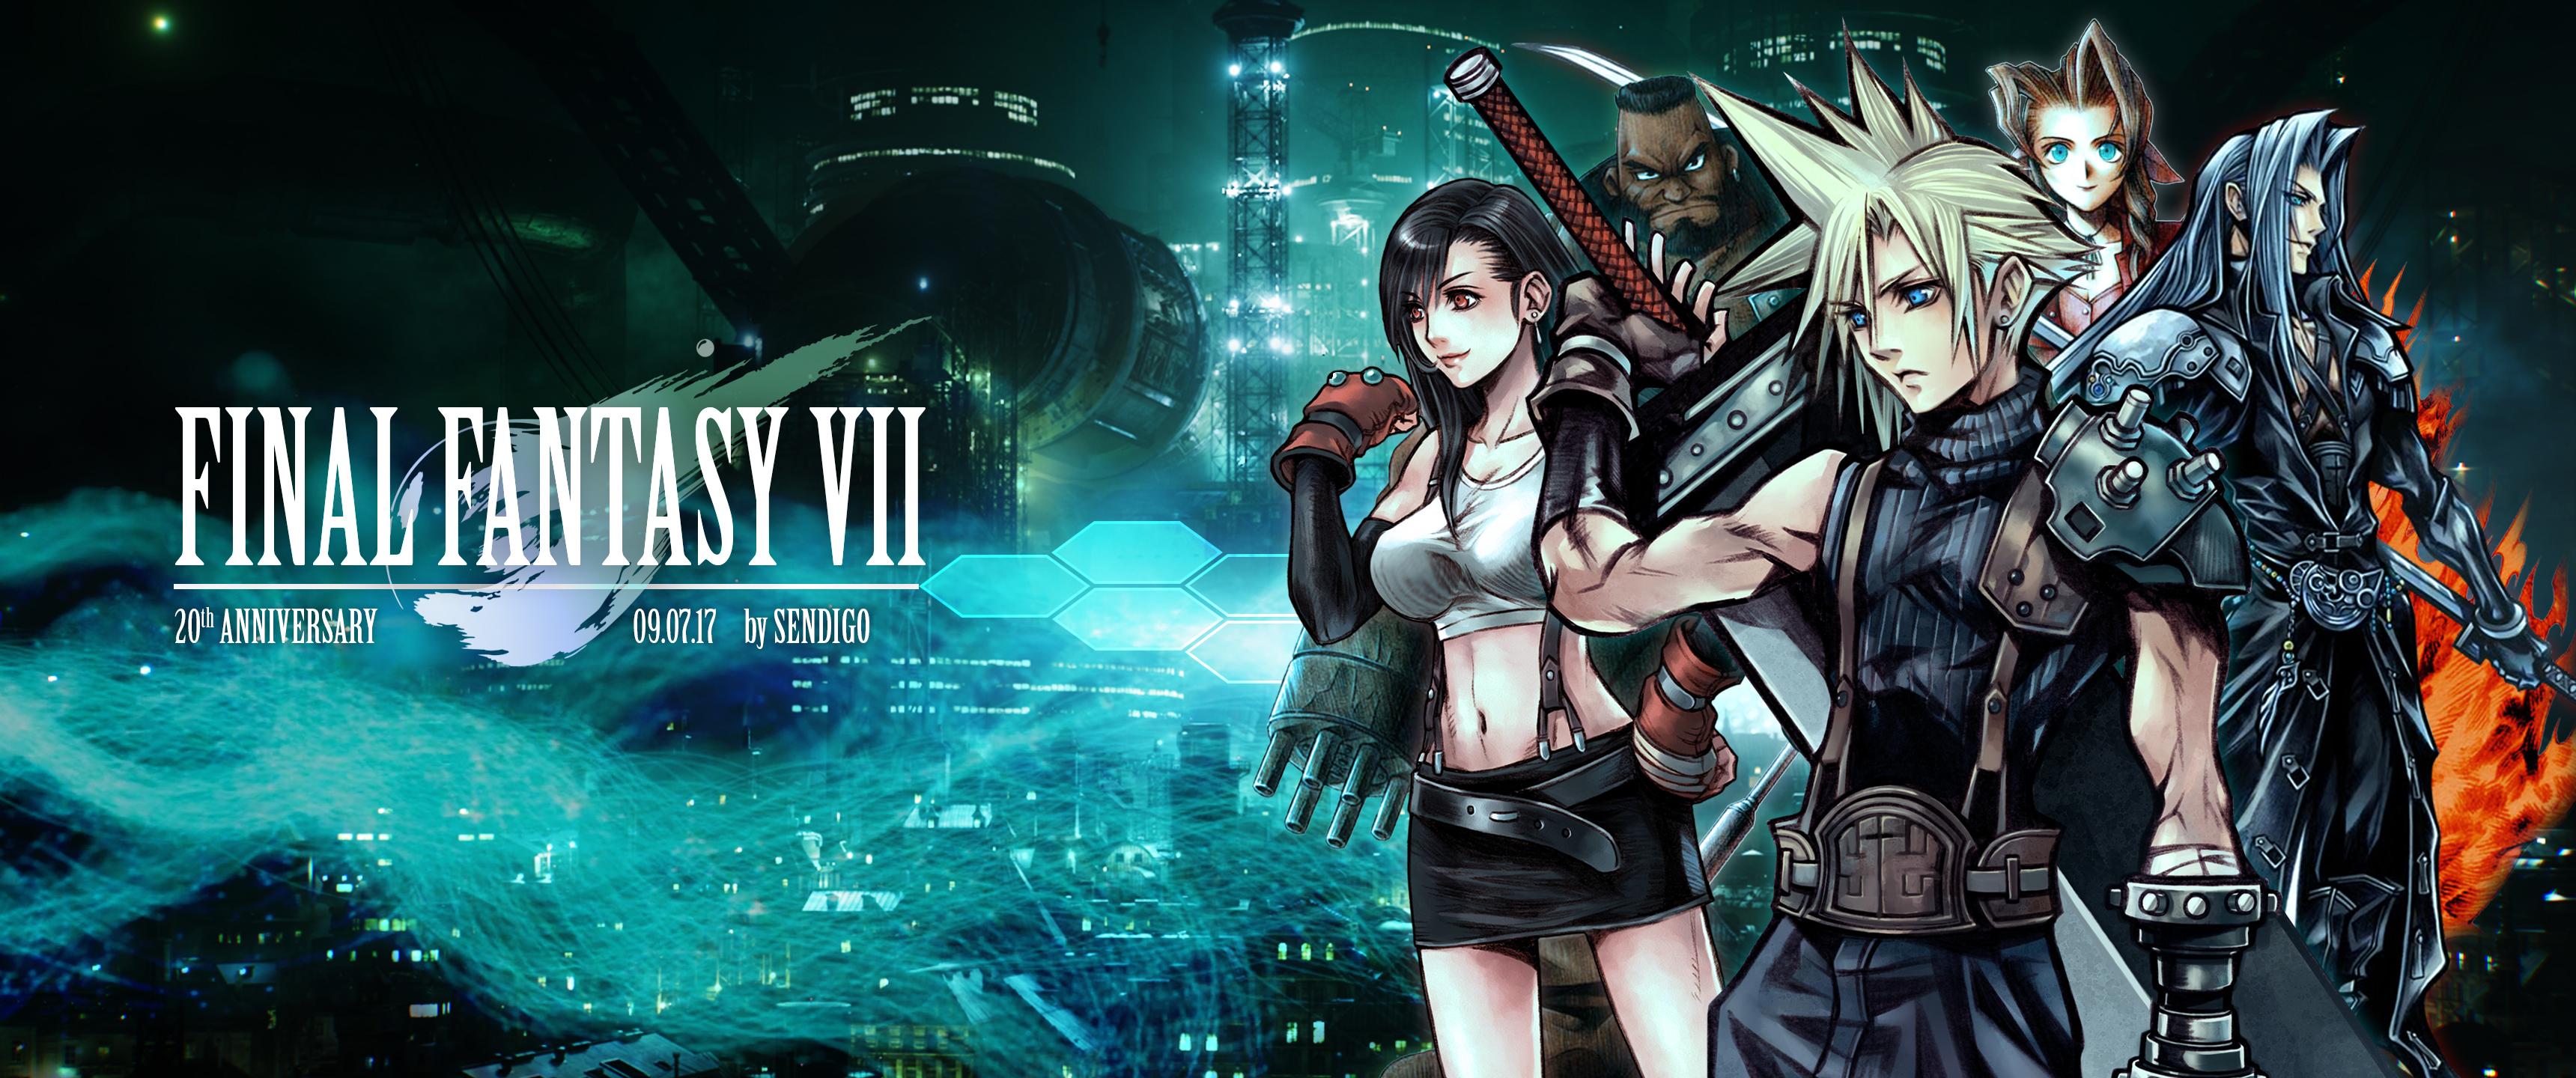 Final Fantasy VII: 20th Anniversary Wallpaper by Sendigo ...